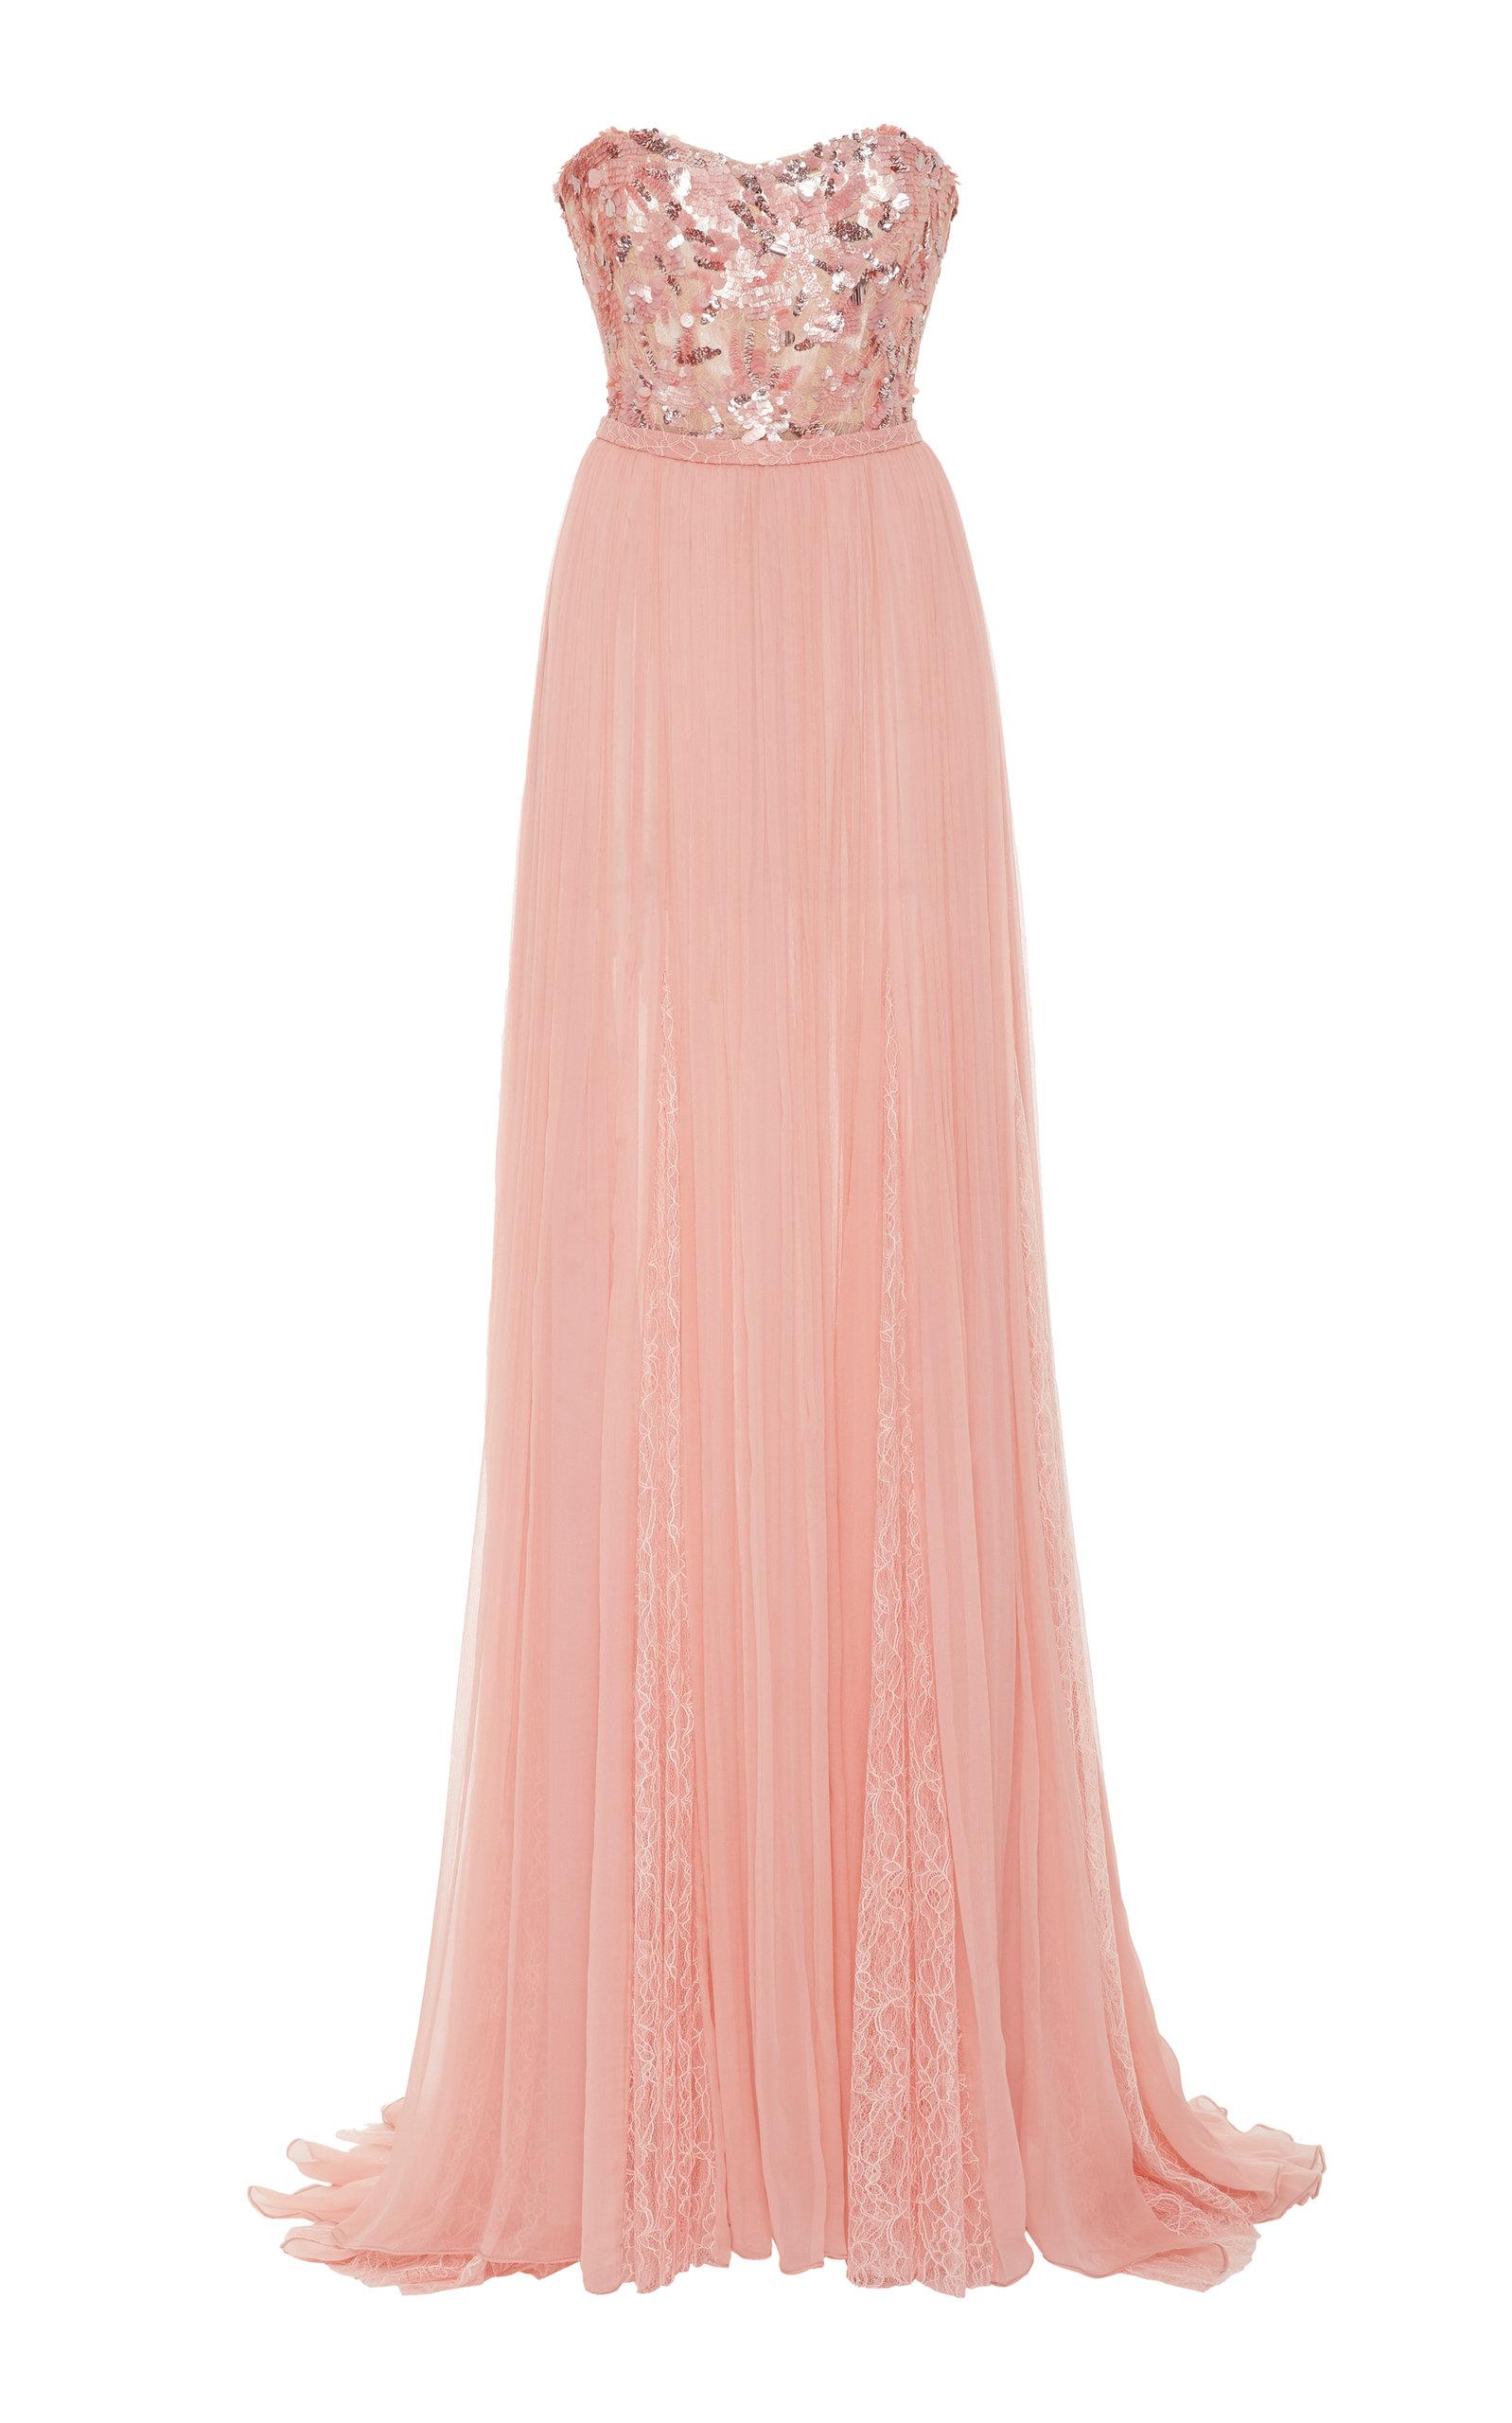 Buy Pamella Roland Strapless Sequin-Embroidered Chiffon Dress online, shop Pamella Roland at the best price